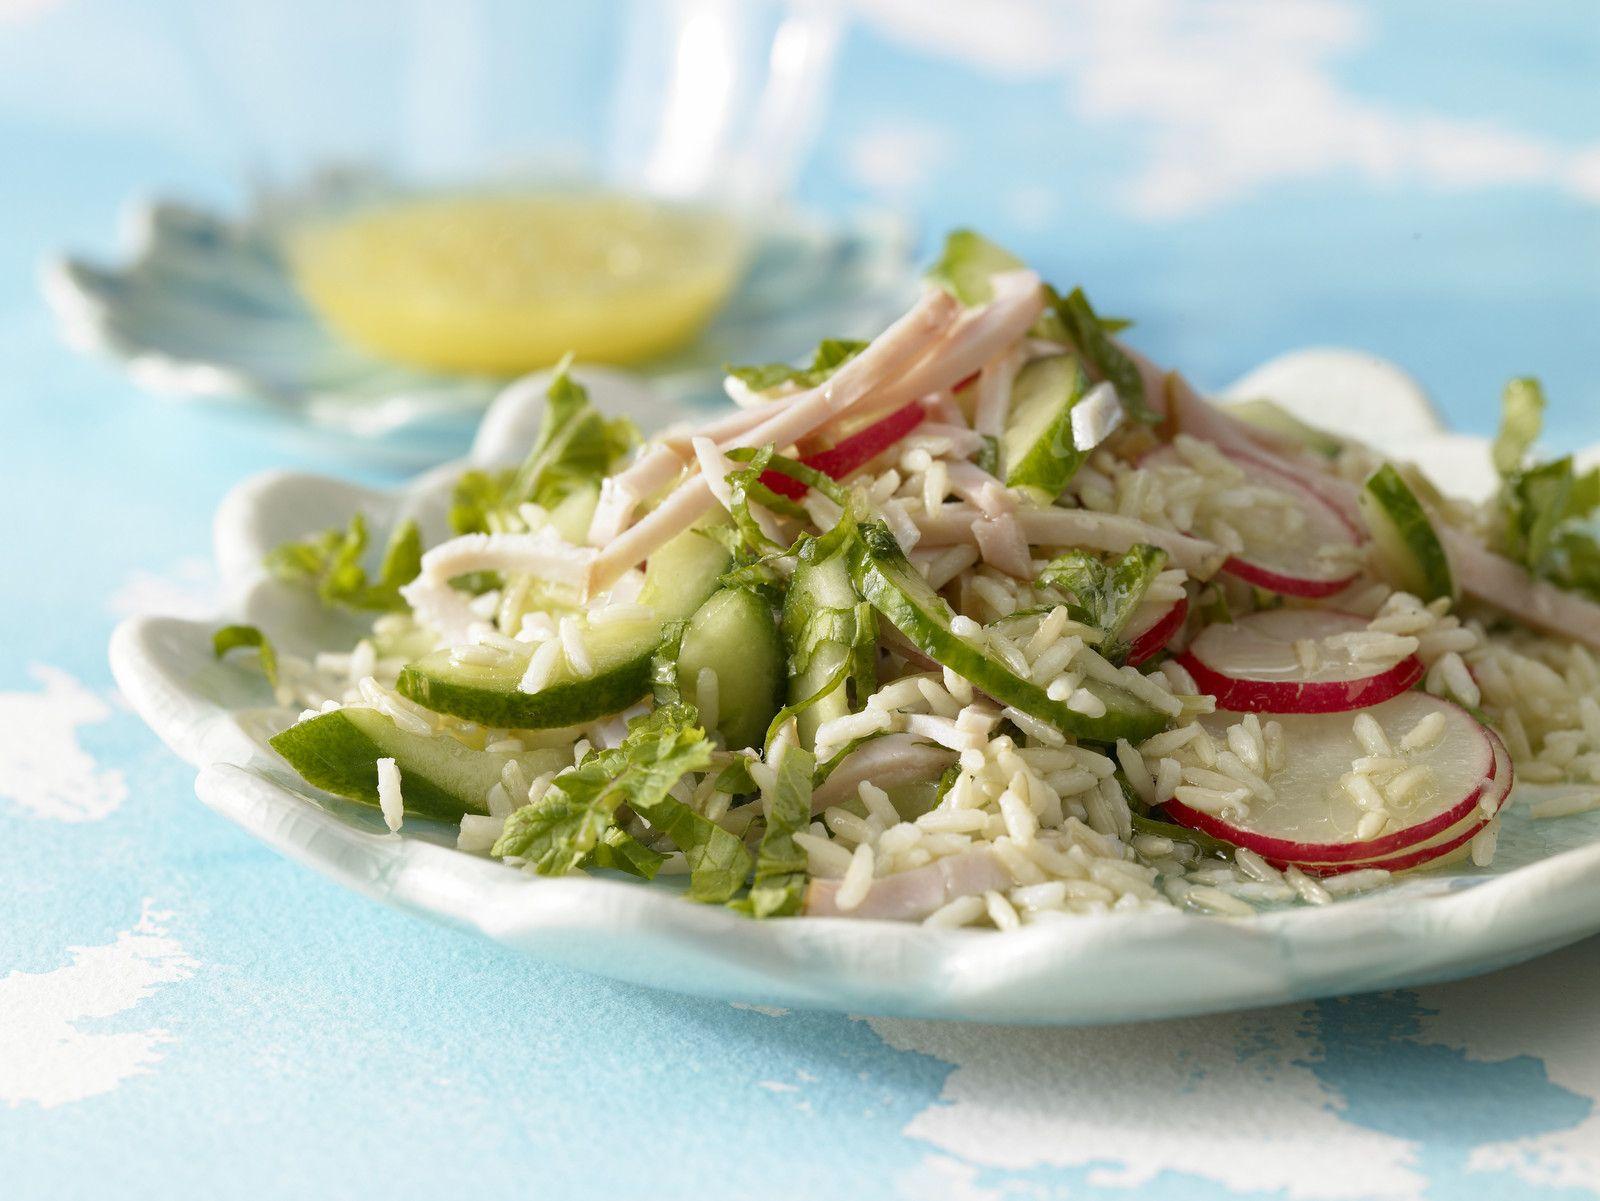 reis-rezepte | eat smarter - Kalorienarme Küche